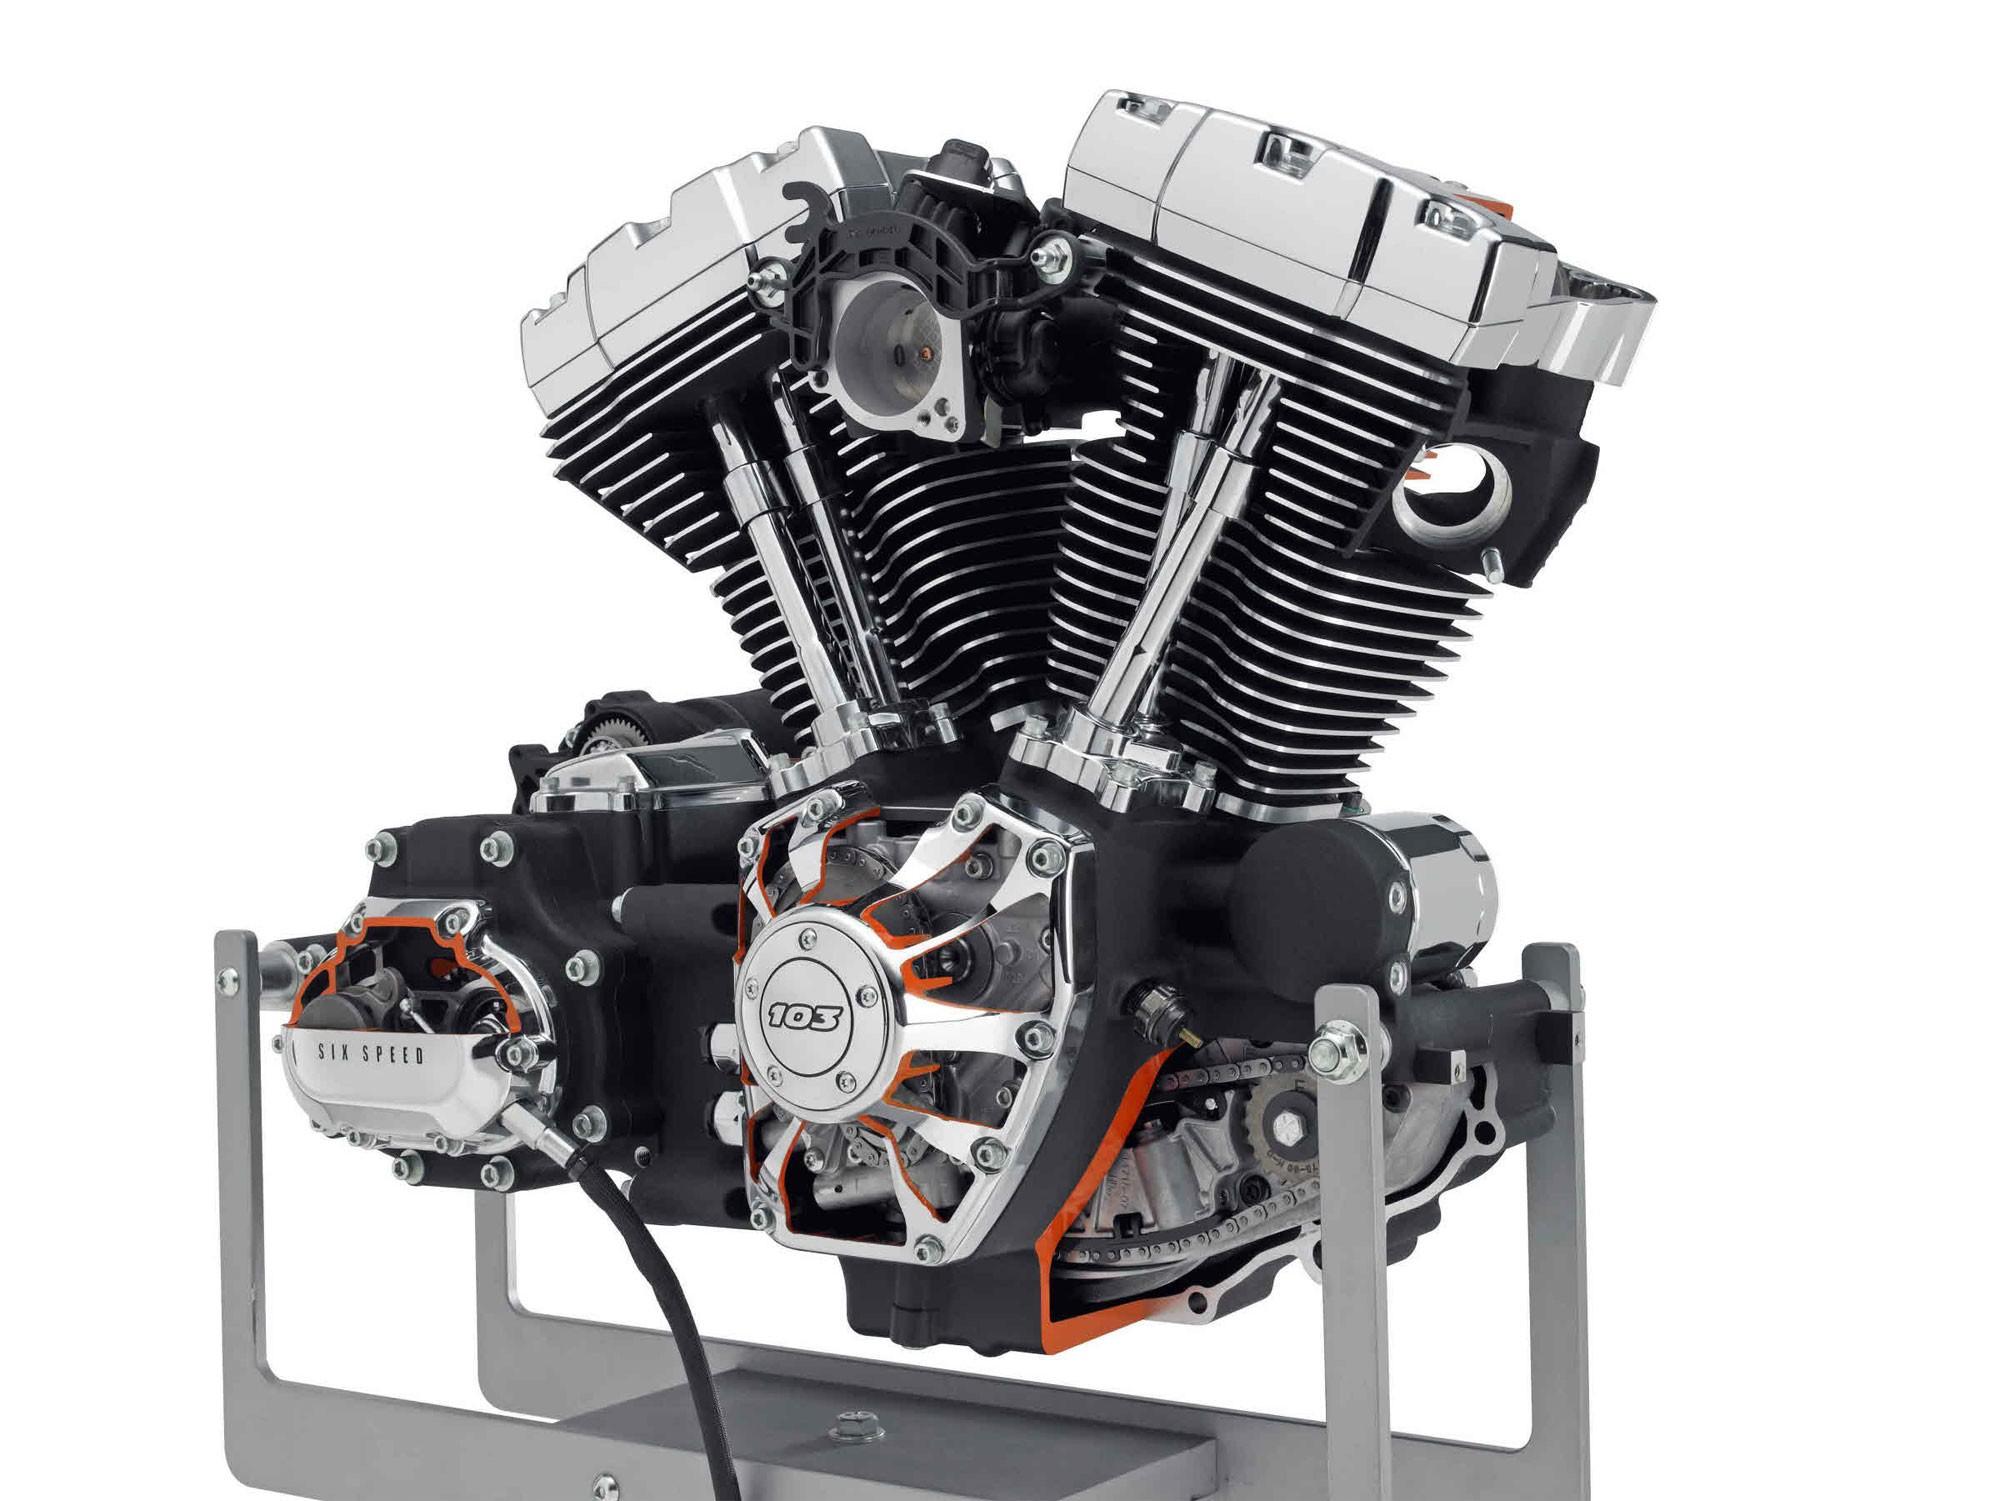 harley twin cam engine diagram my wiring diagram rh detoxicrecenze com Harley-Davidson Apparel Harley-Davidson Emblem